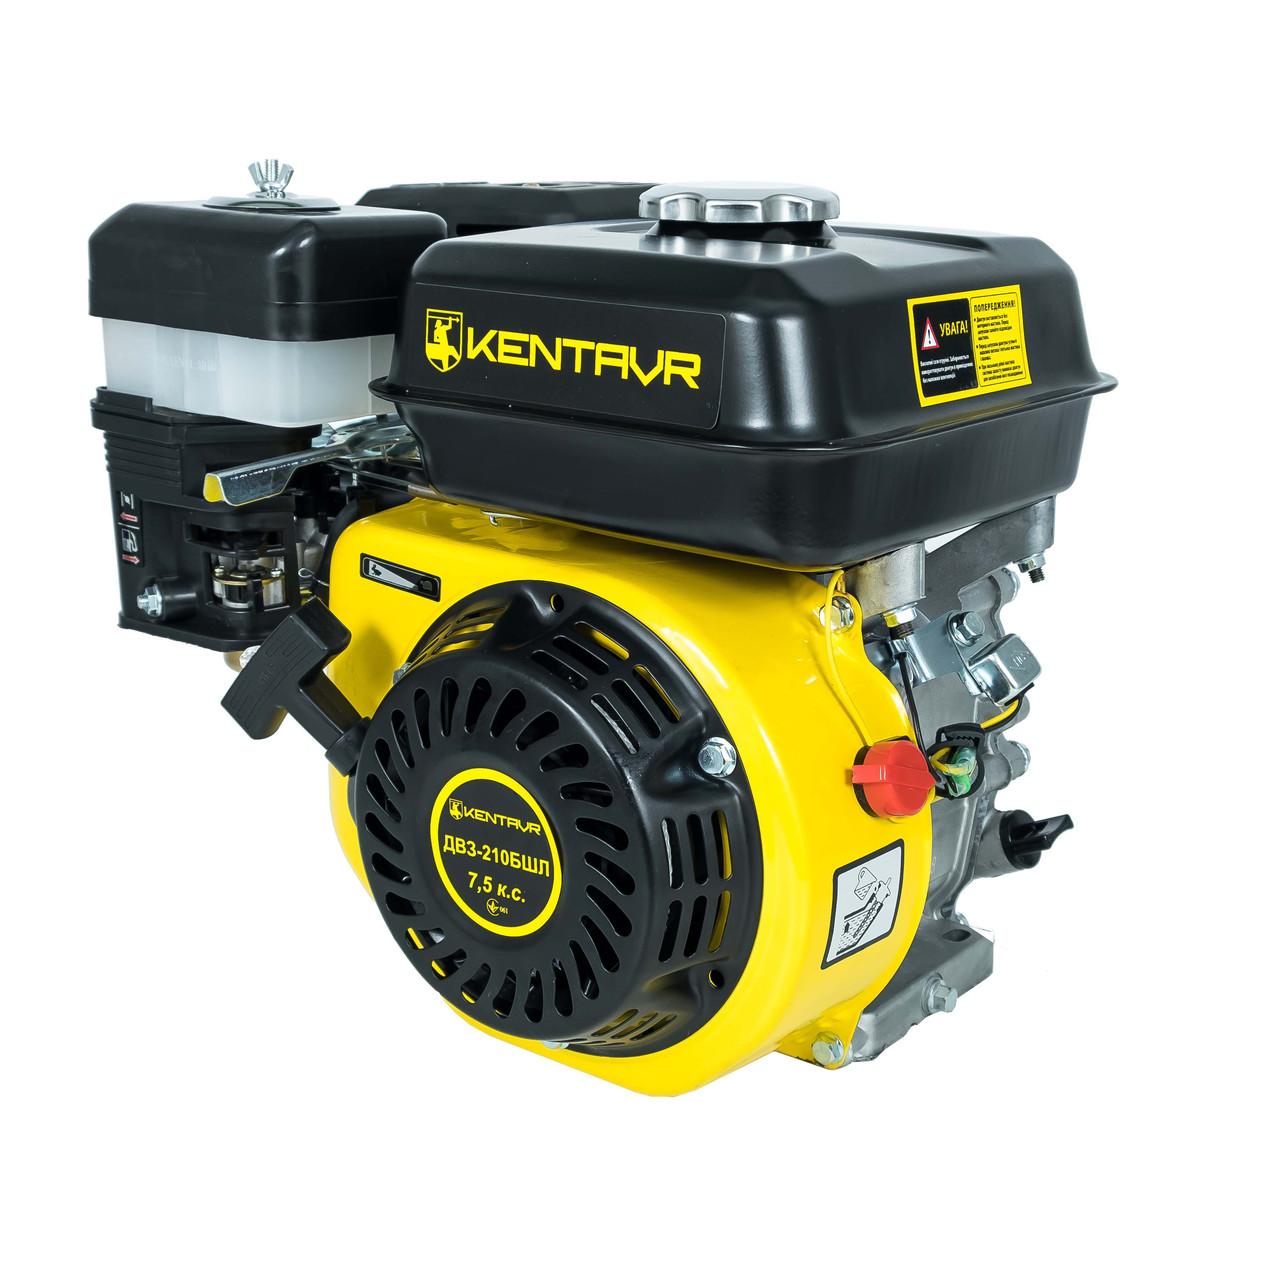 Двигатель бензиновый Кентавр  ДВЗ-210БШЛ (7,5 л.с., шлиц, вал 25мм)